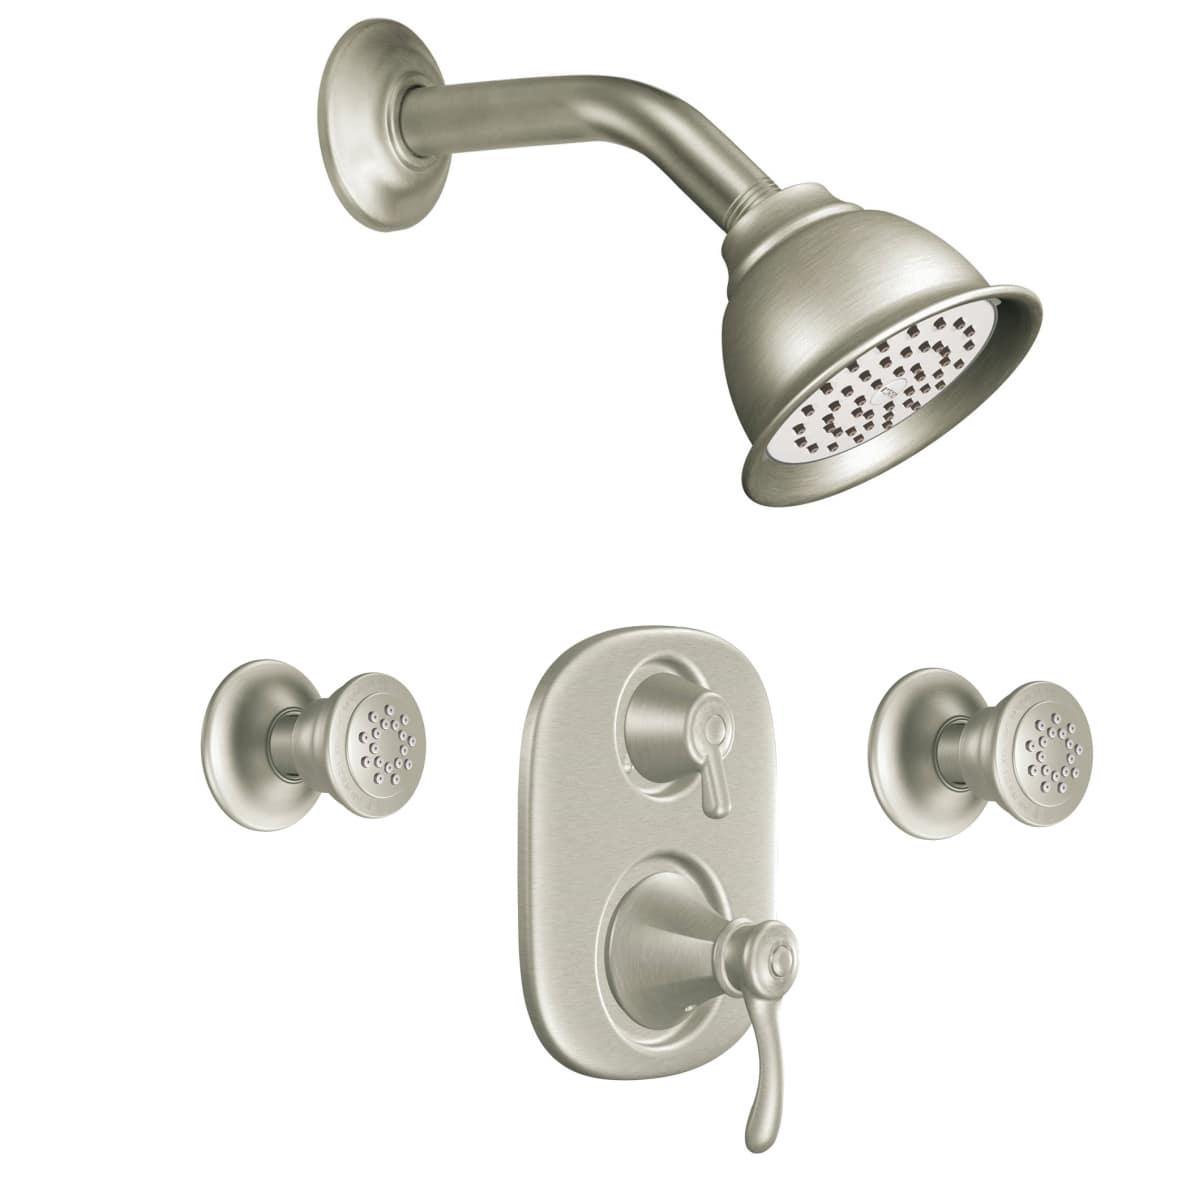 Moen 773 Chrome Pressure Balanced Shower System With Shower